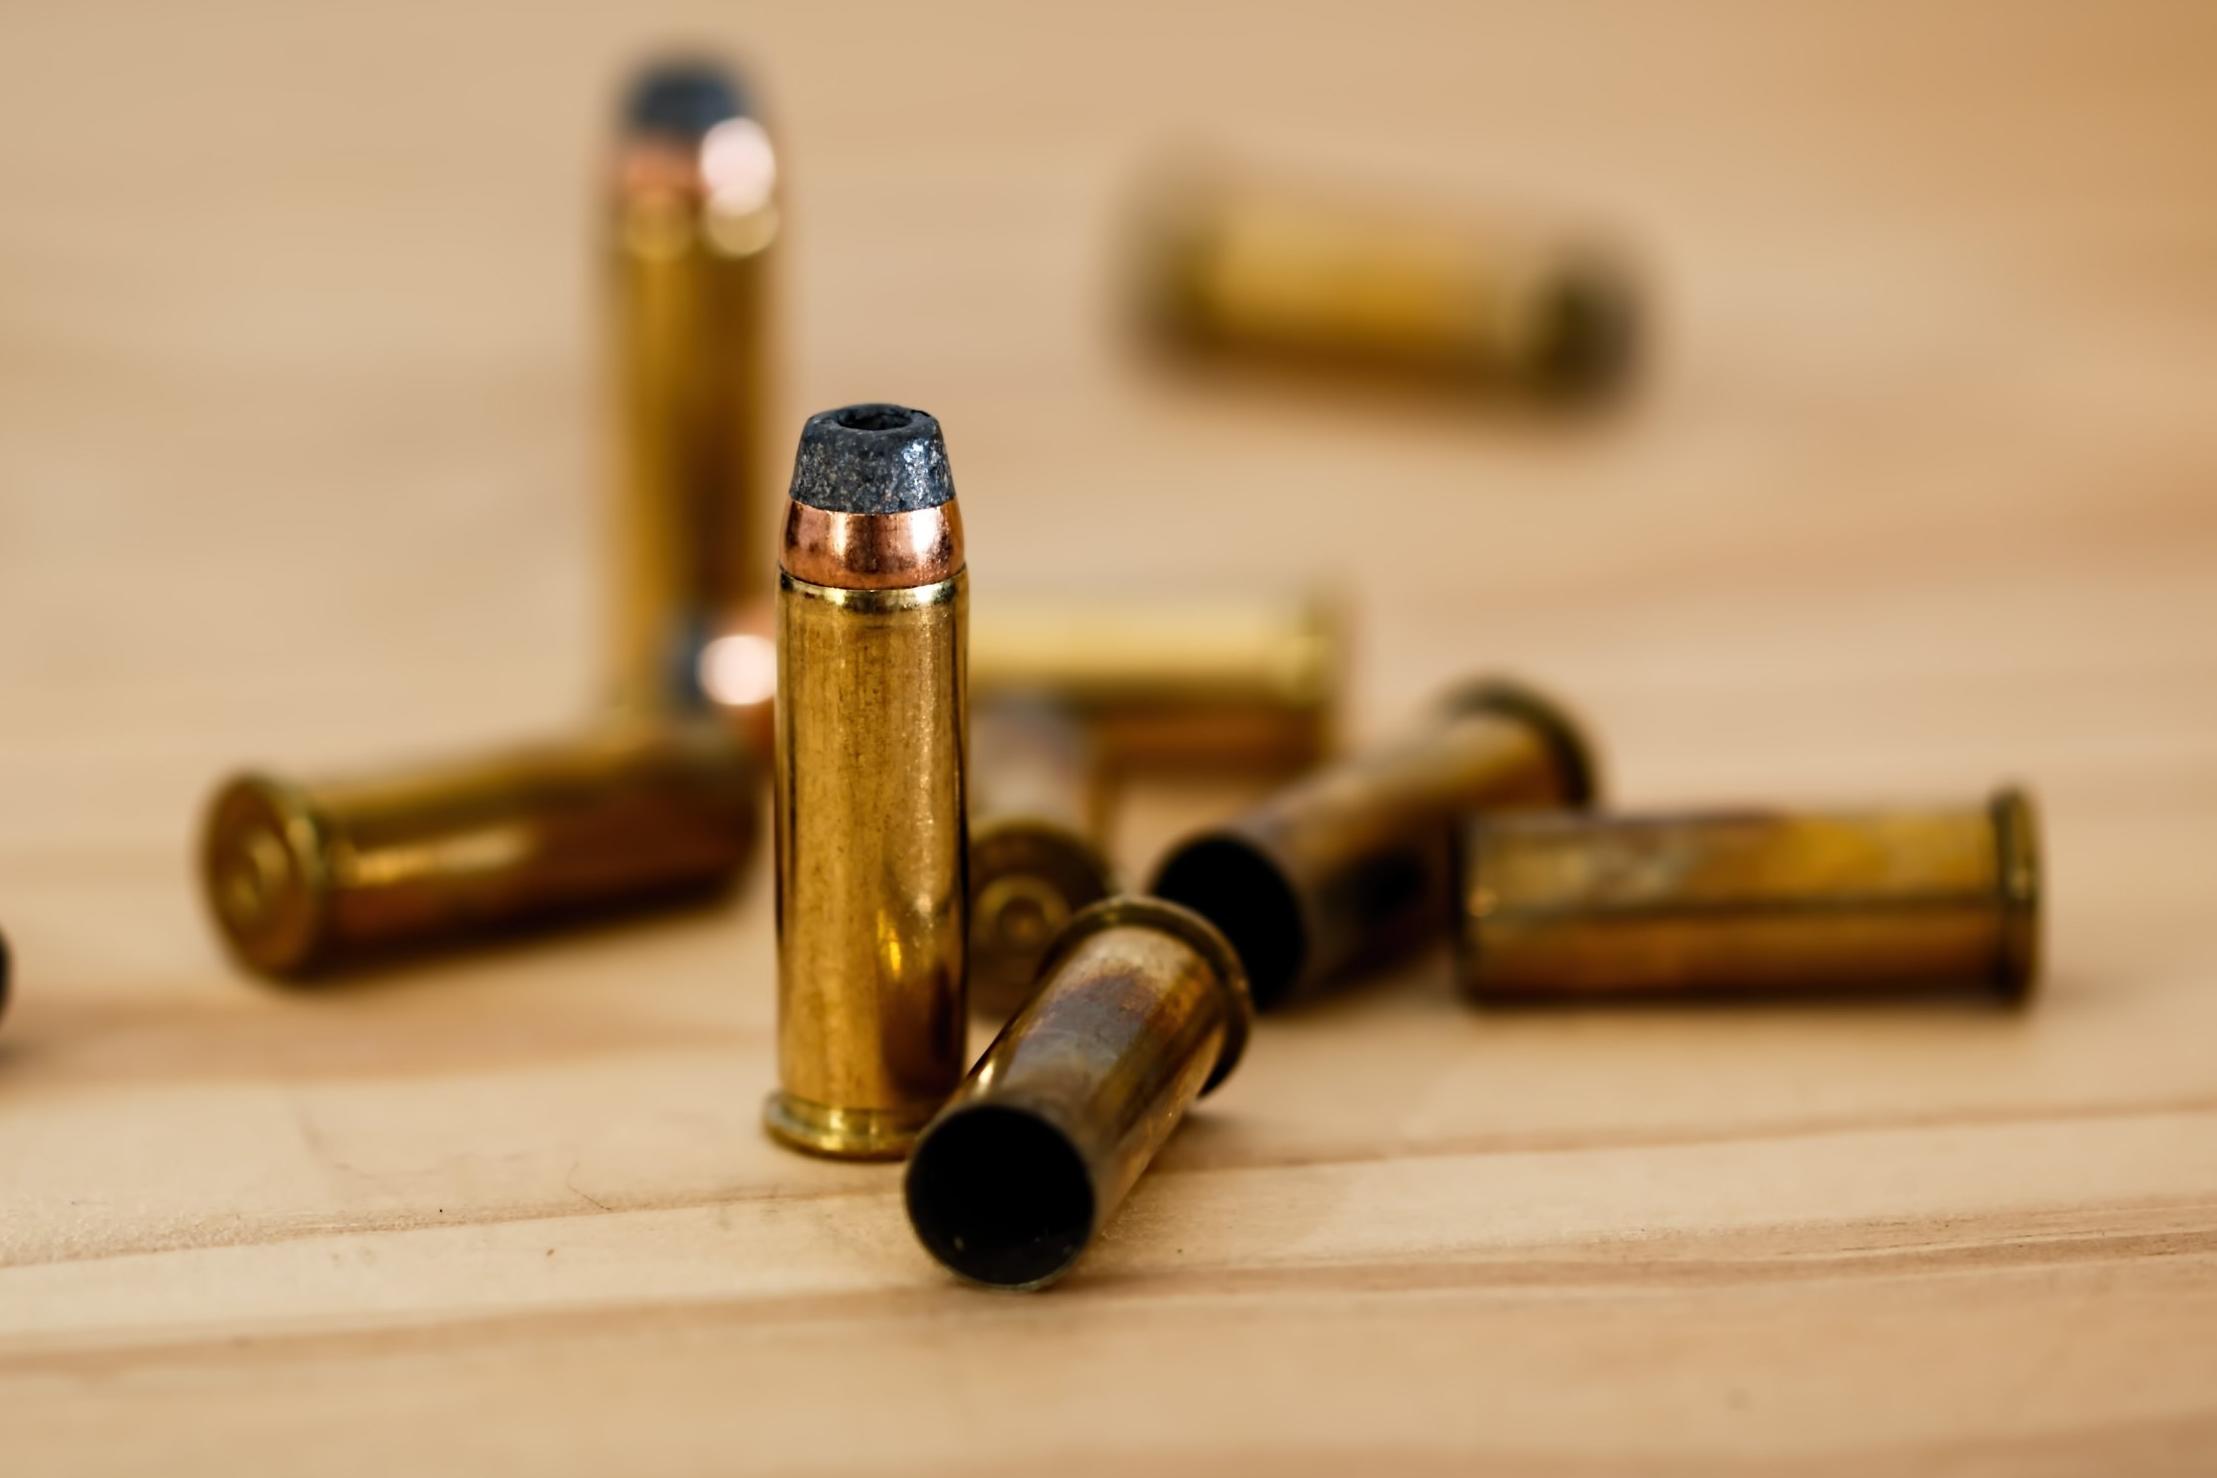 bullet-cartridge-ammunition-crime-53224.jpeg